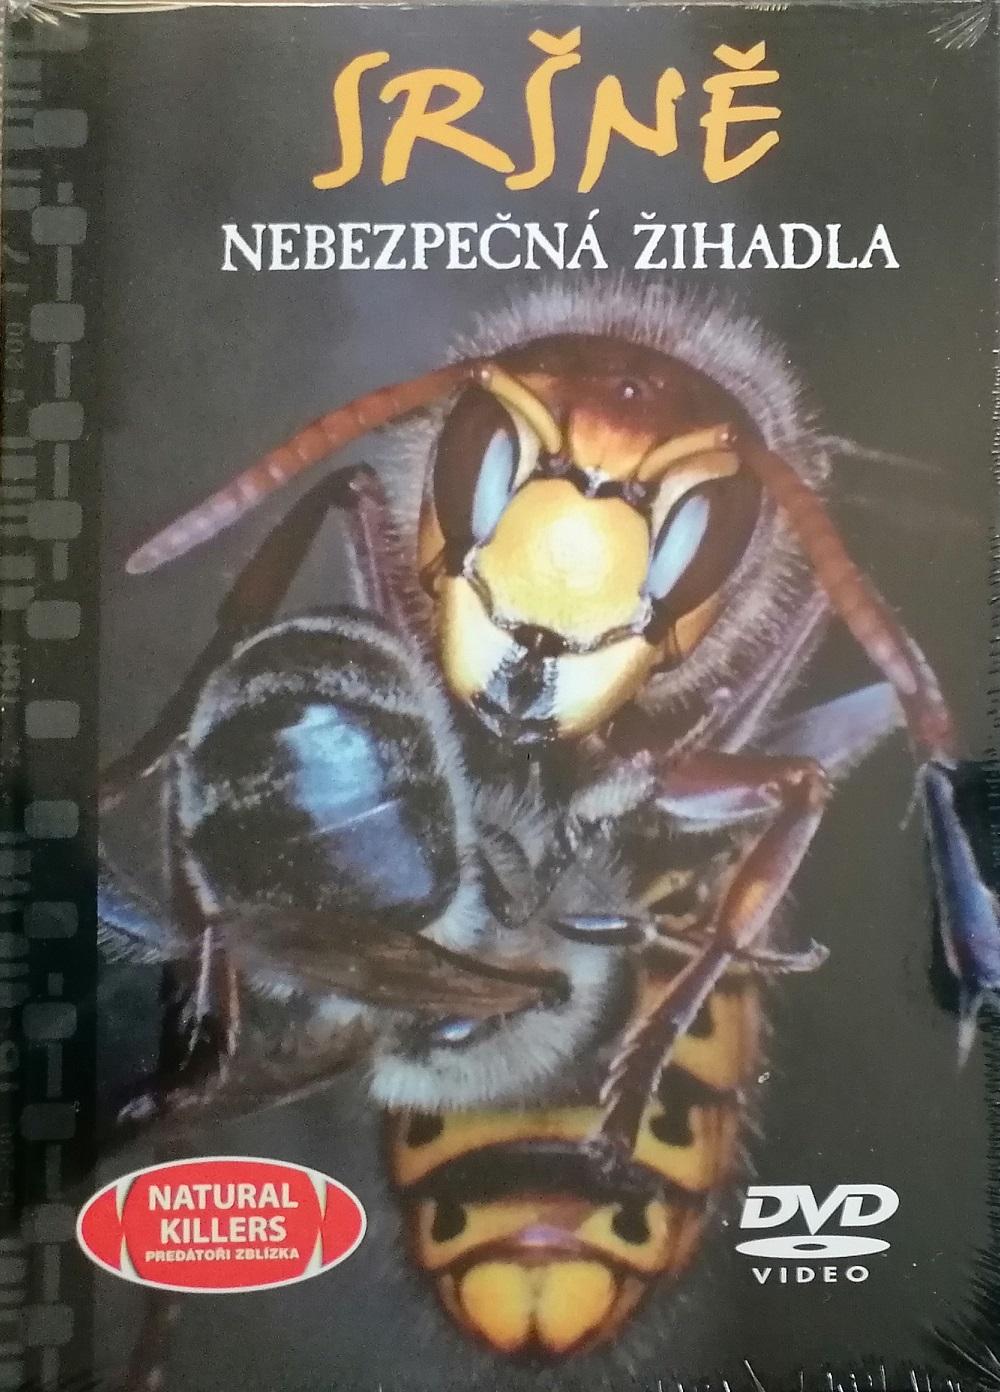 Sršně - Nebezpečná žihadla - DVD + brožura